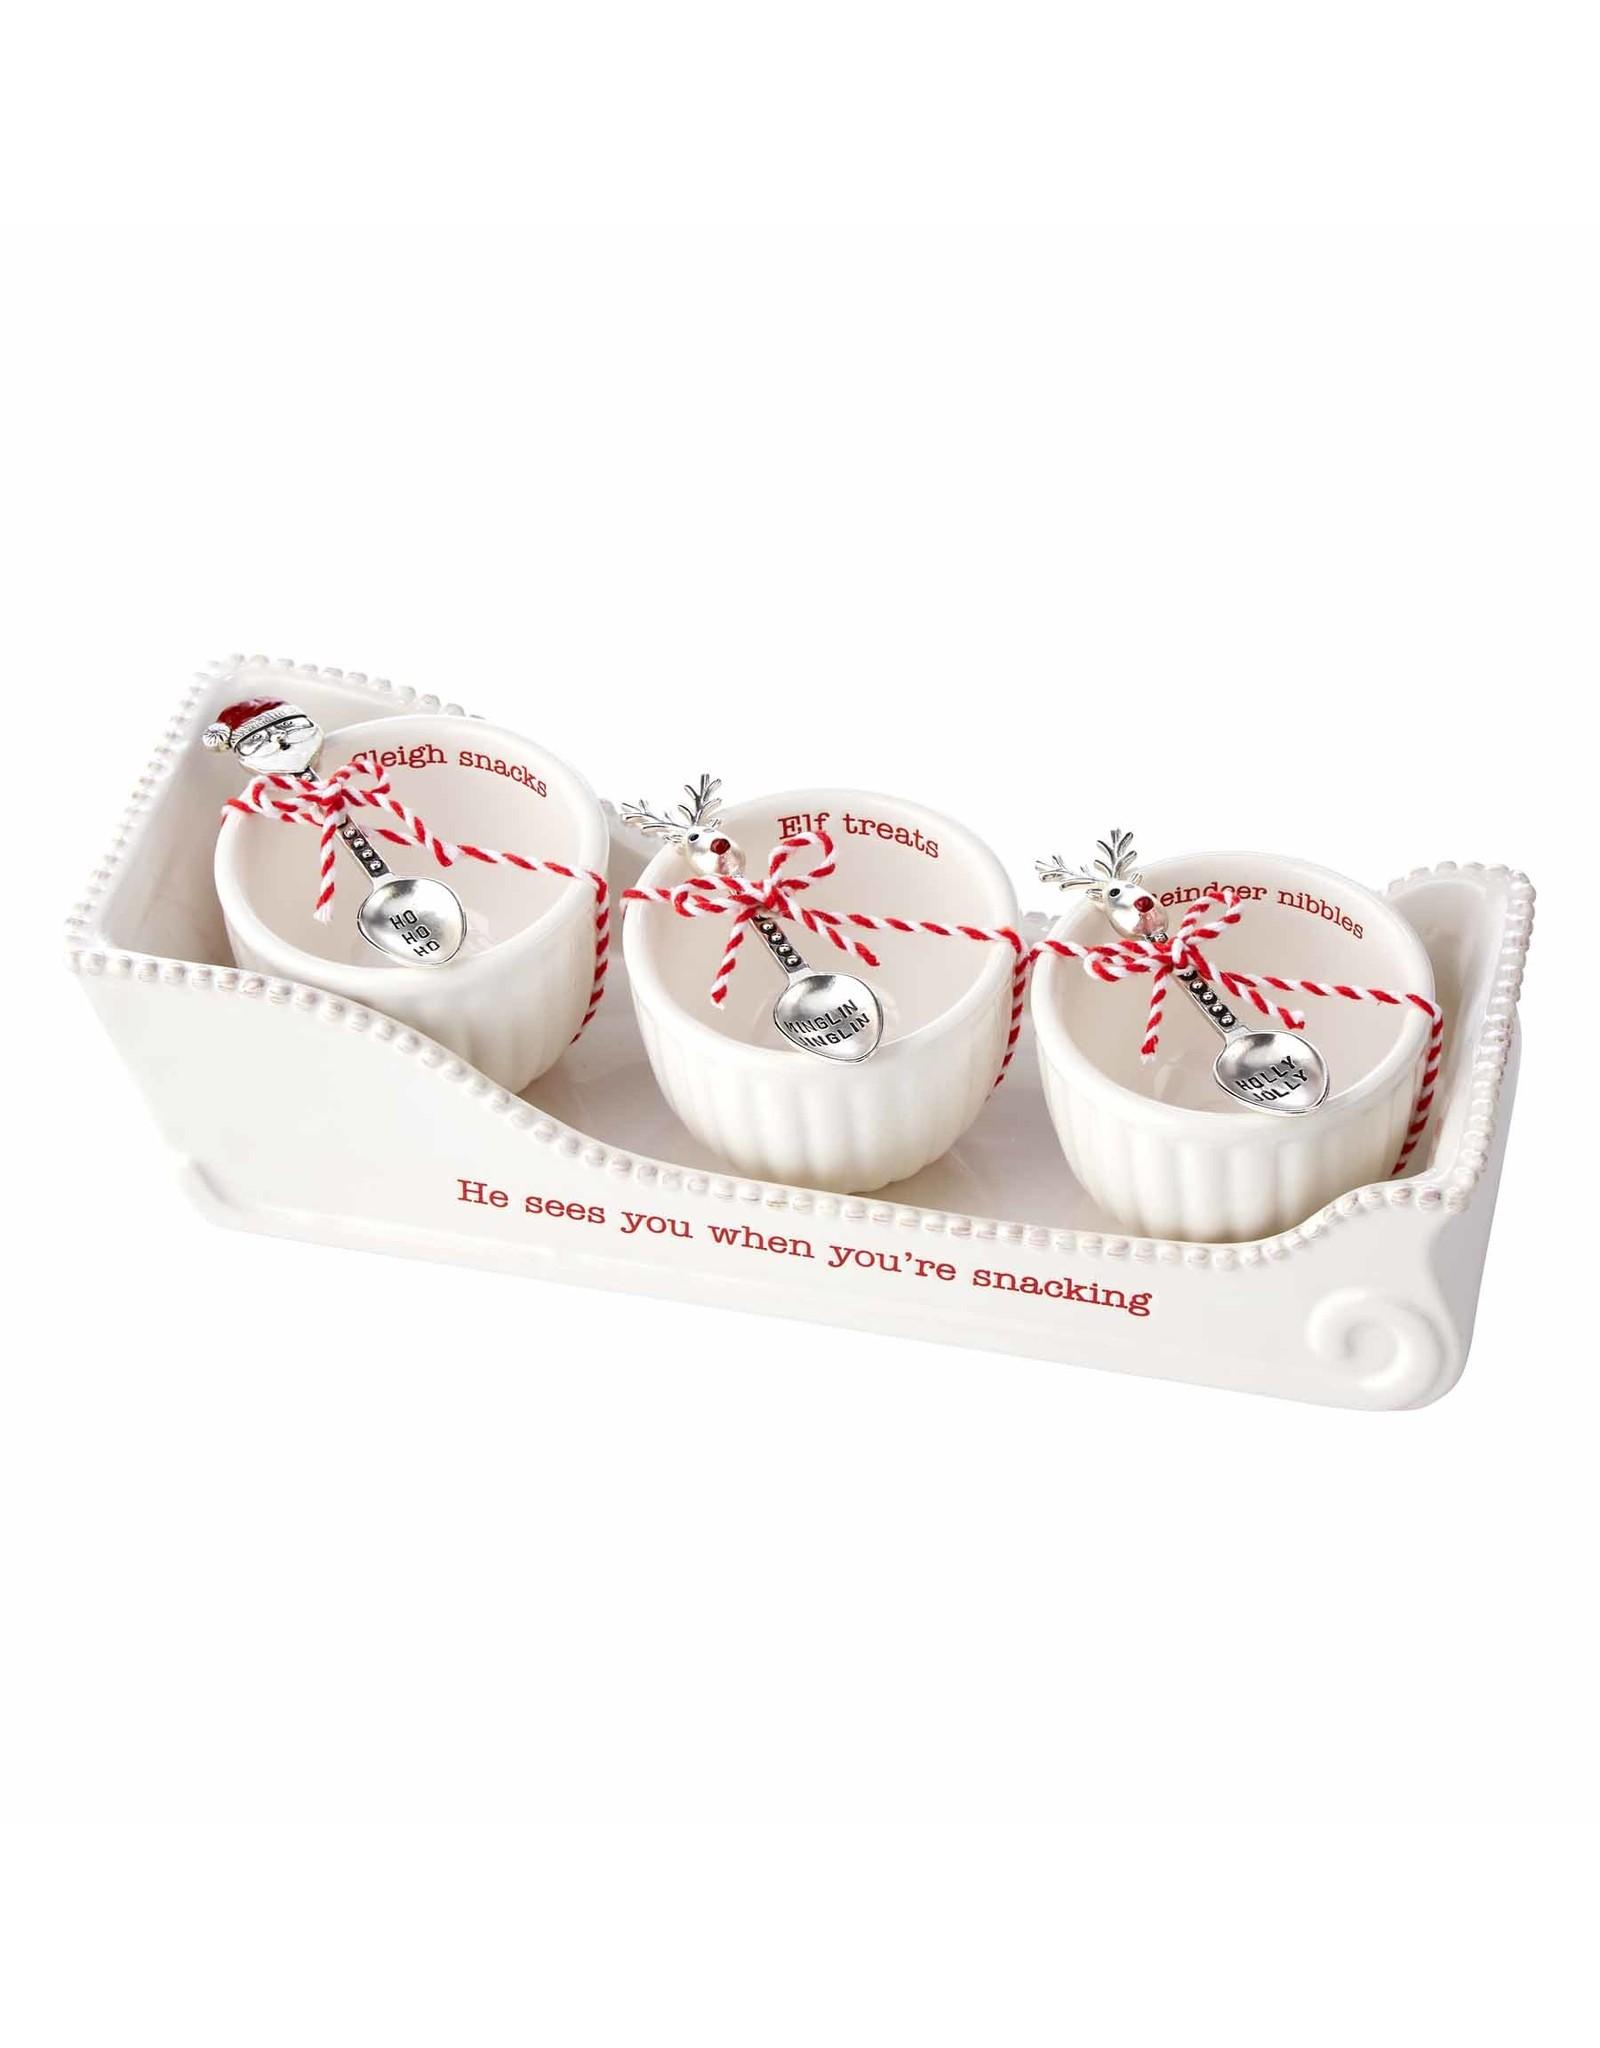 Accessories Shop at Junebug Sleigh Cracker Dish & Bowl Set